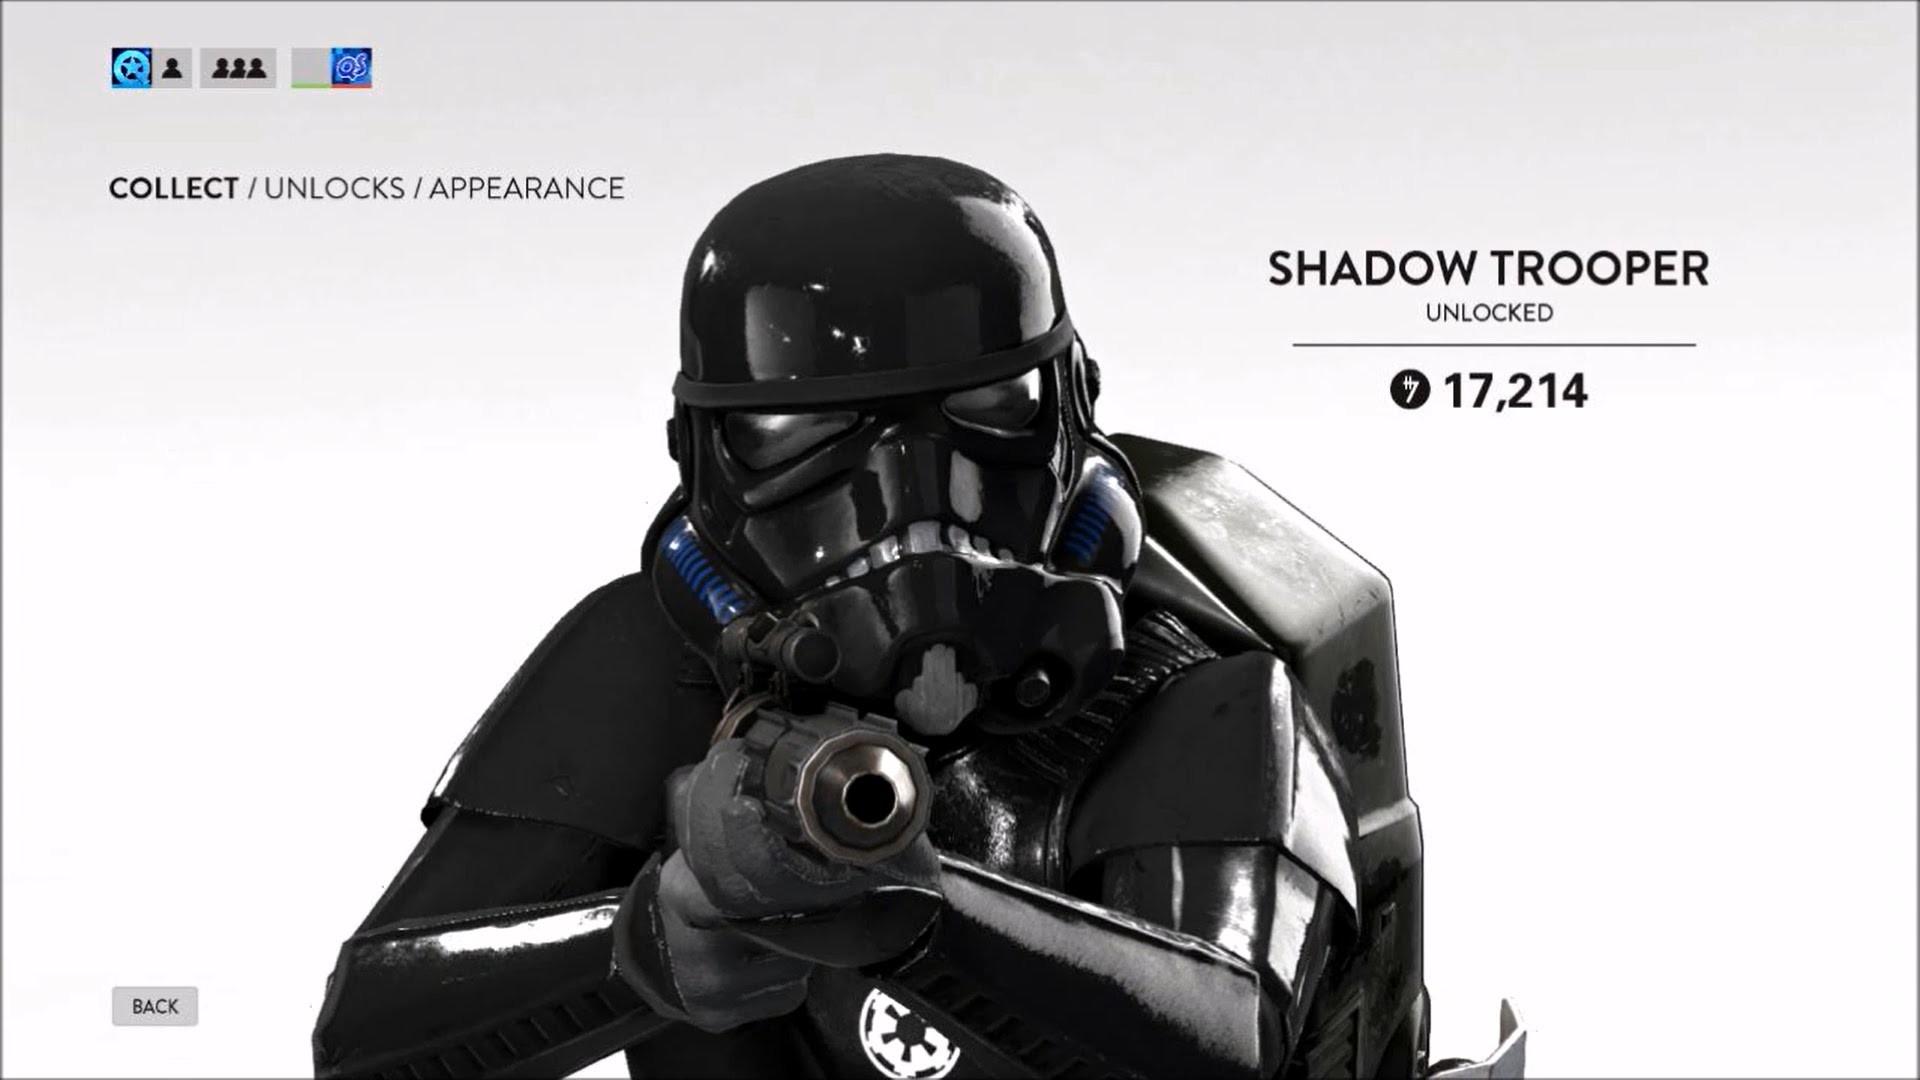 Star Wars Battlefront: Unlocking The Shadow Trooper & Twi'lek Rebel!